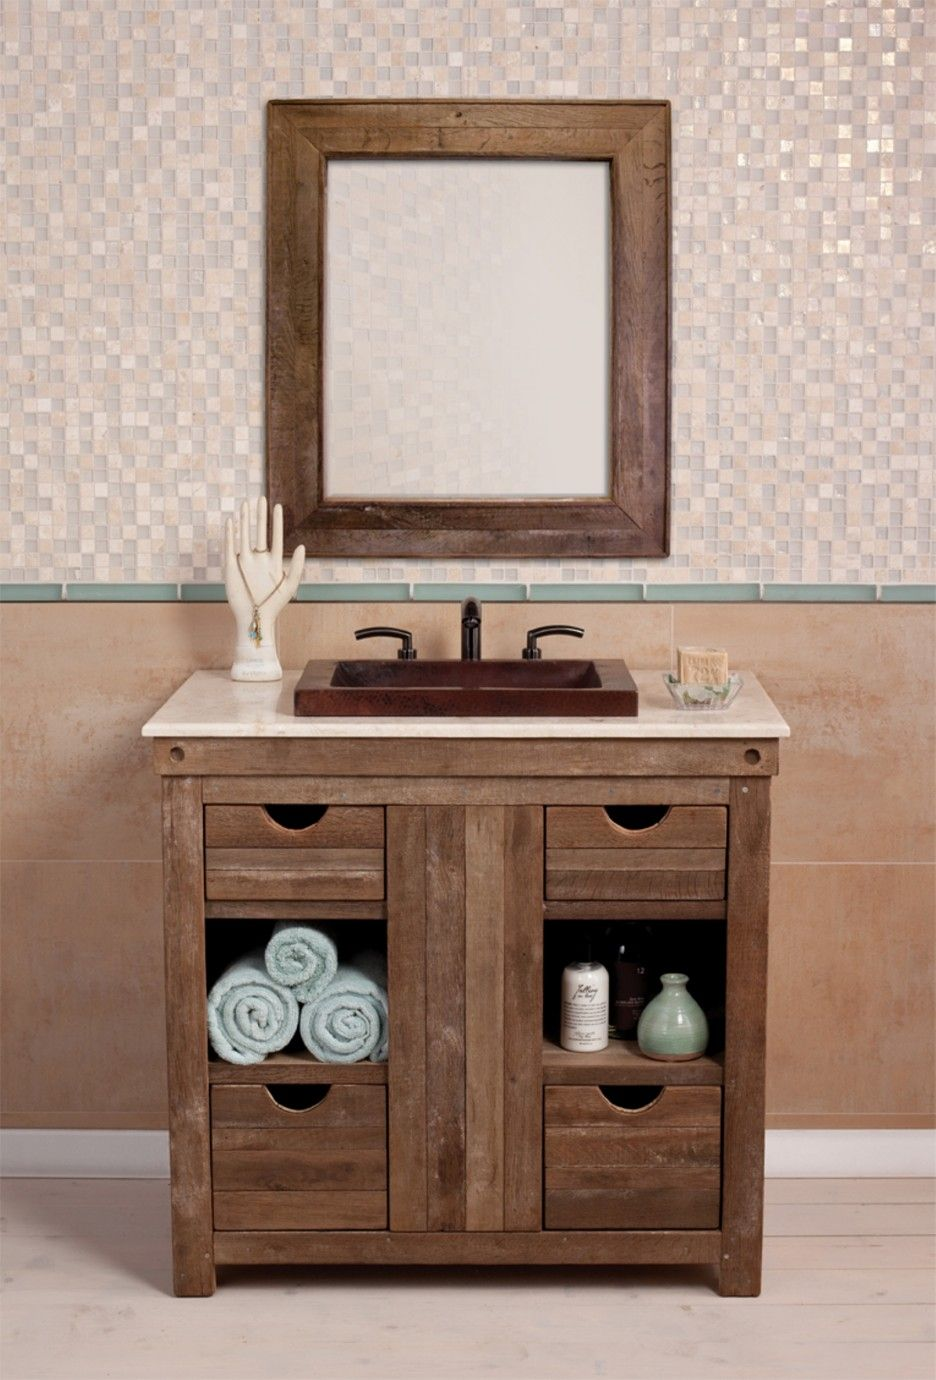 Traditional Rustic Sink For Bathroom Idea Featuring Wall Mounted Oak Wood Brown Beige Rustic Bathroom Vanities Small Bathroom Vanities Rustic Bathroom Designs [ 1380 x 936 Pixel ]